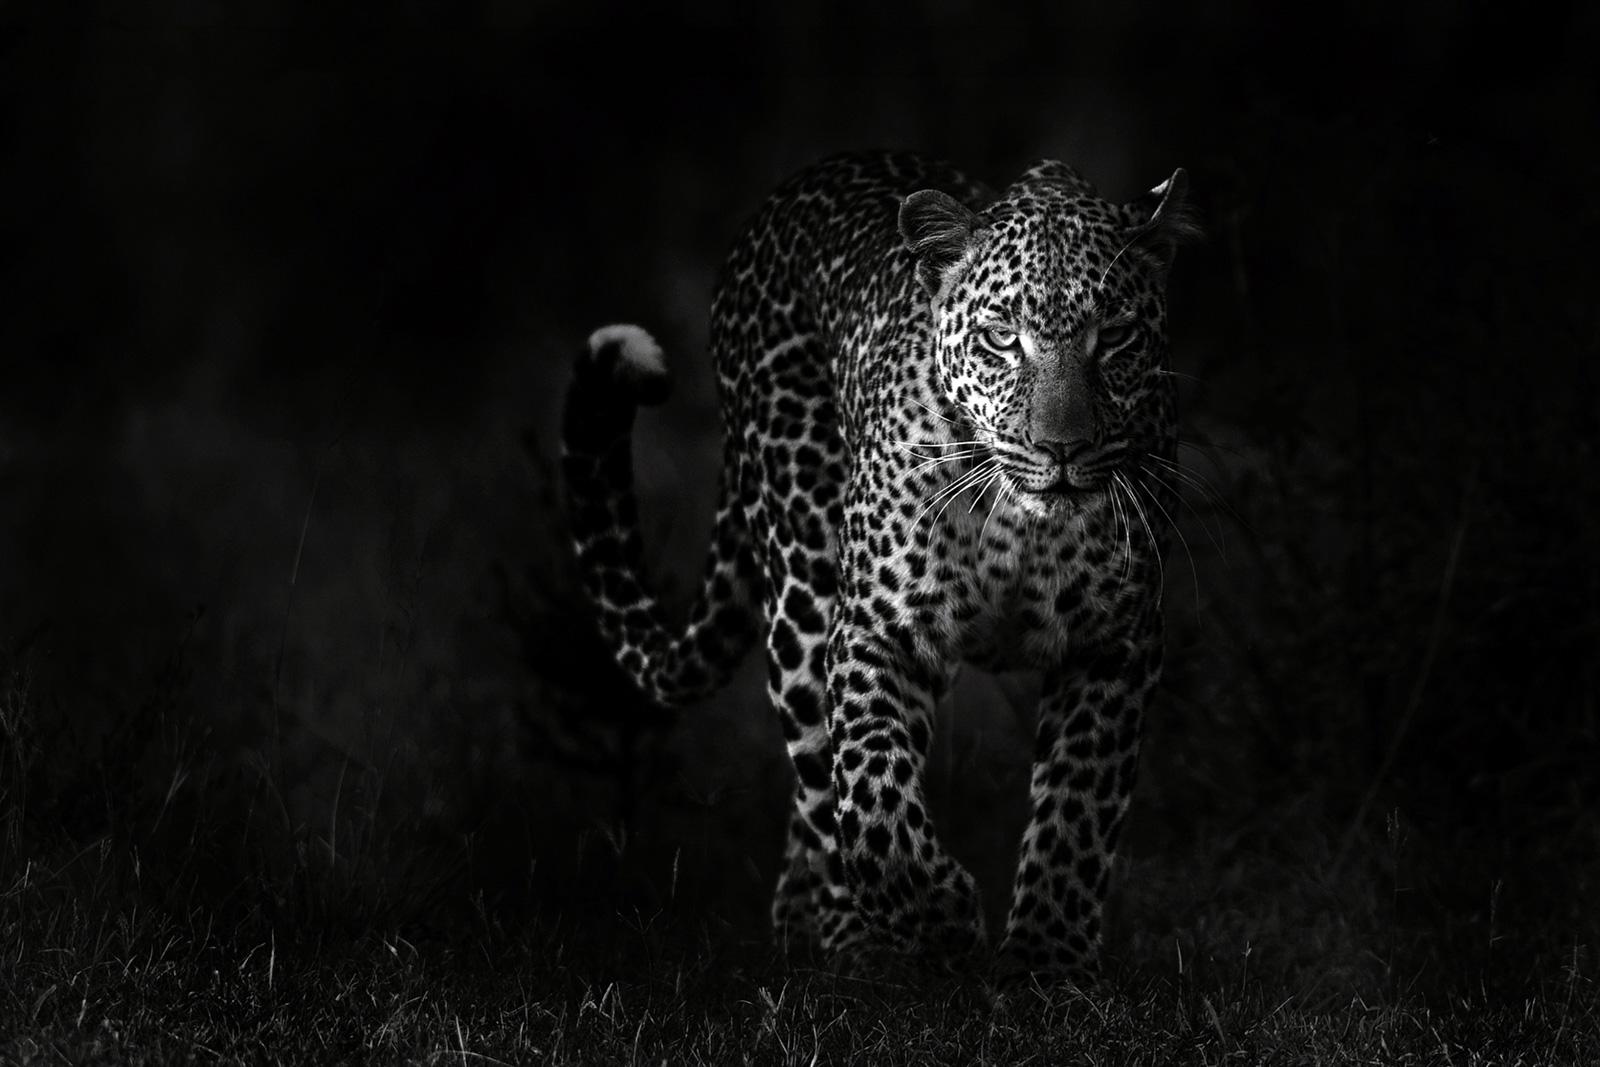 Underexposed leopard photo